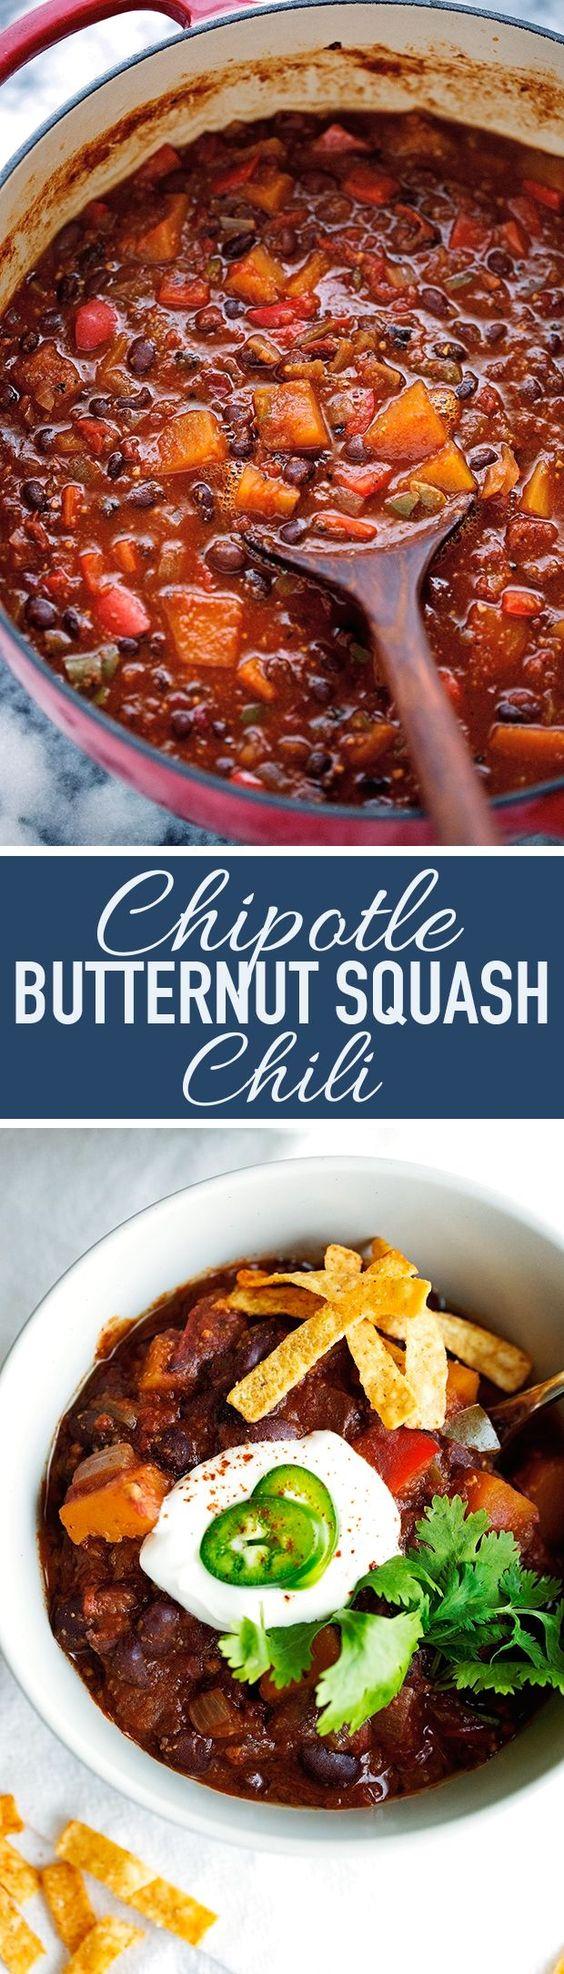 Chili powder, Ground turkey and Squashes on Pinterest